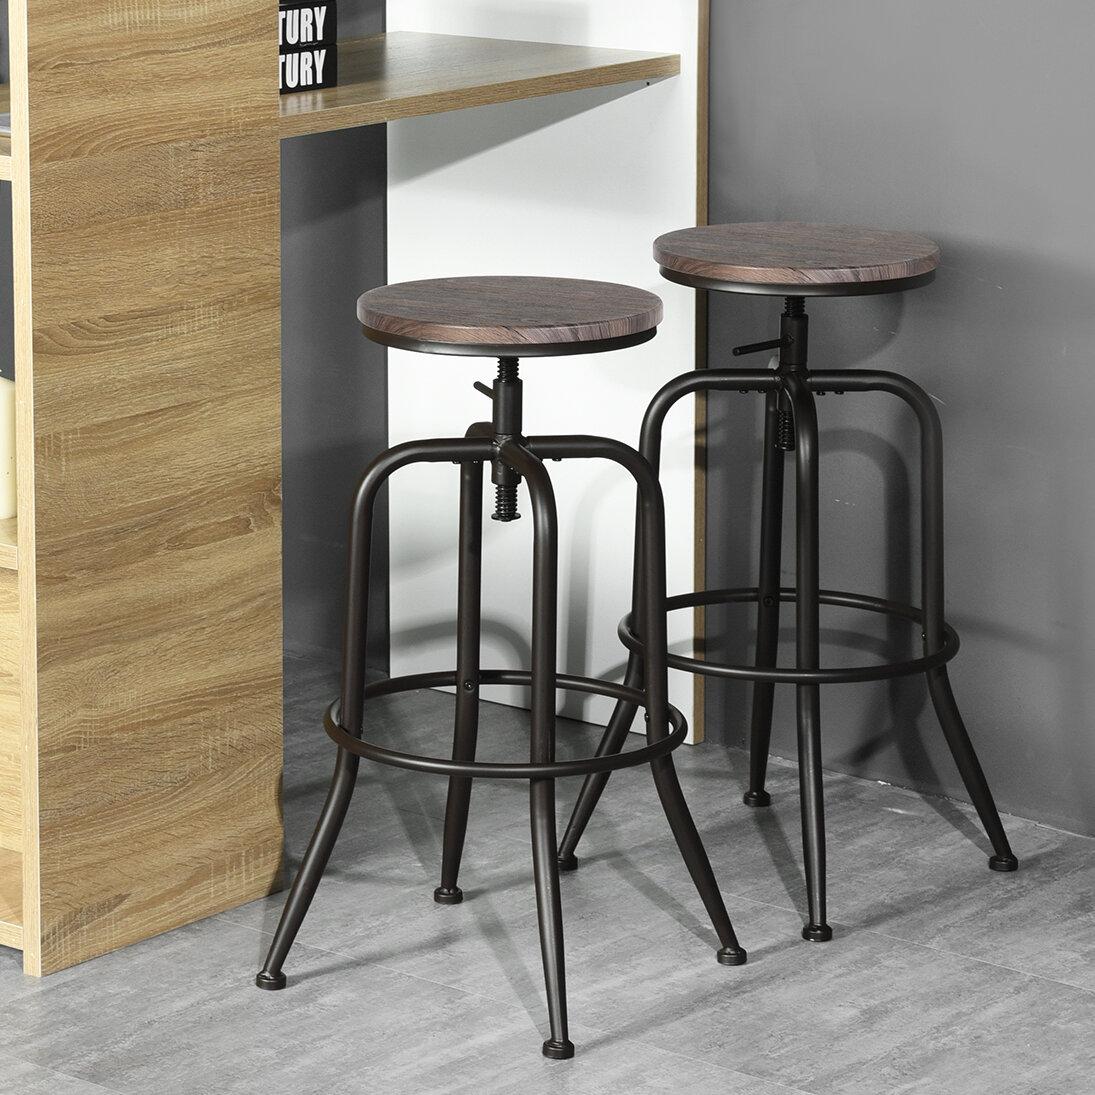 Swell Jolene Adjustable Height Swivel Barstools Cjindustries Chair Design For Home Cjindustriesco